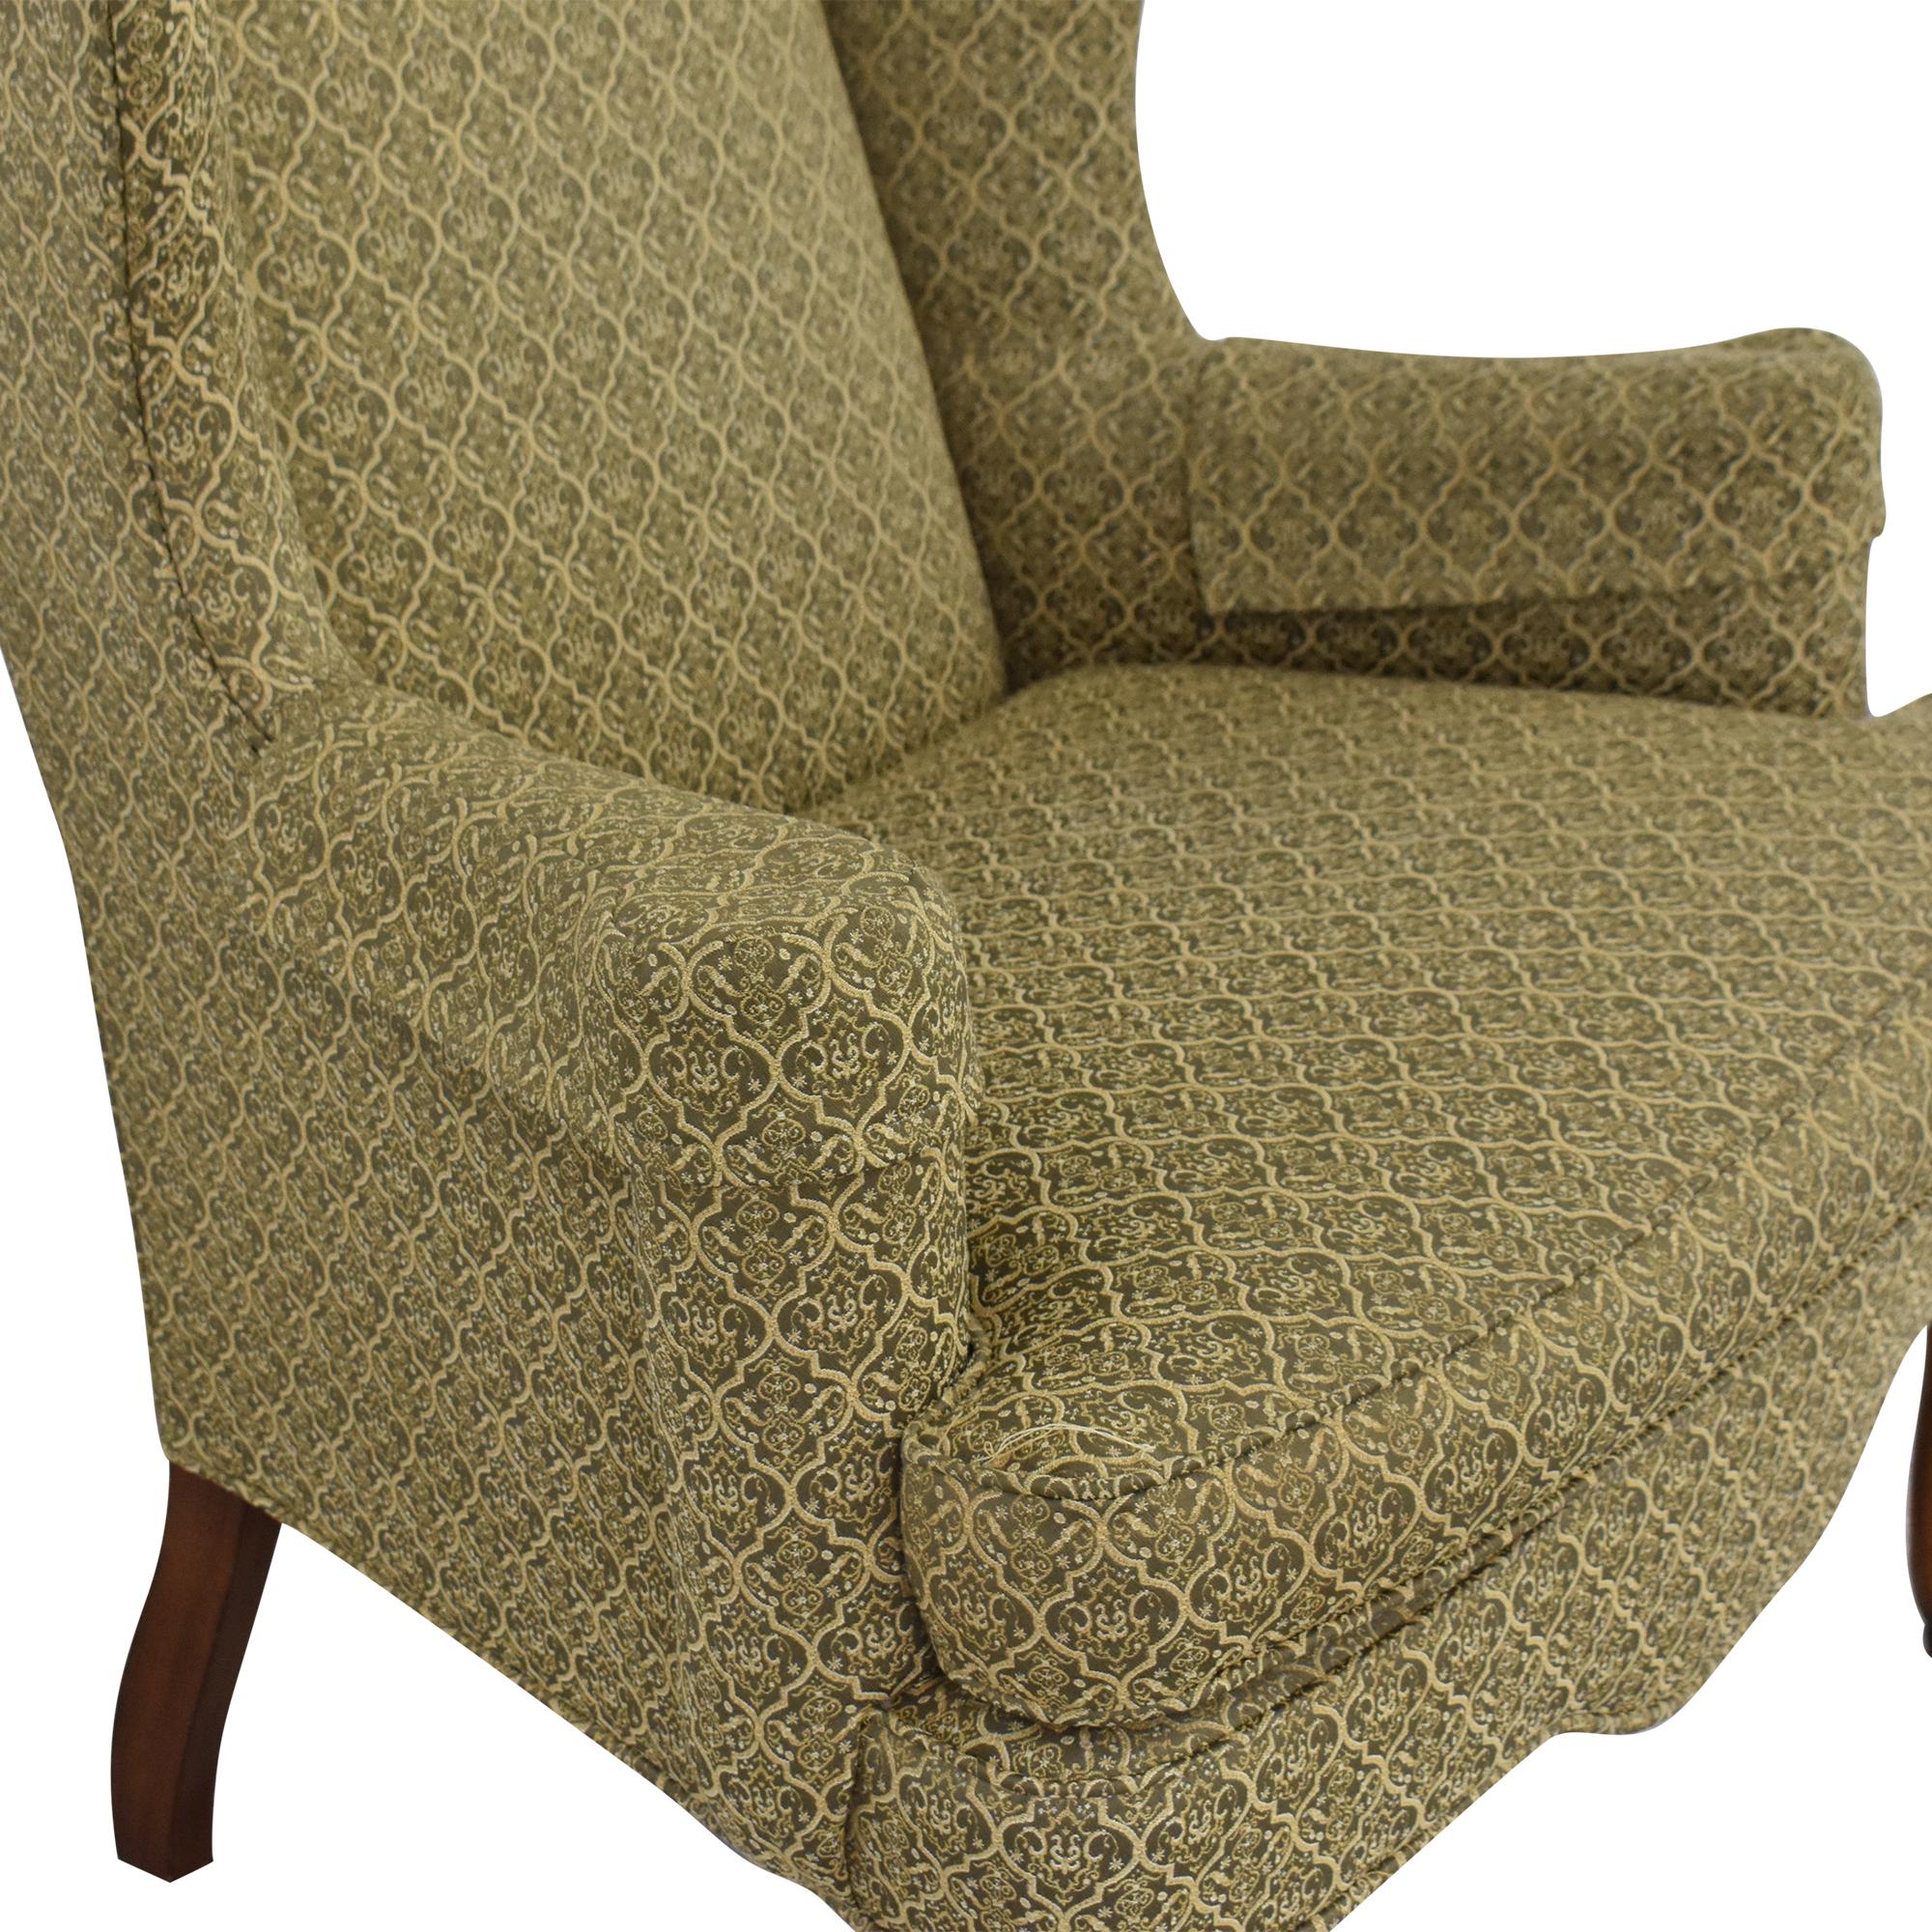 shop Ethan Allen Queen Anne Wing Chair Ethan Allen Chairs